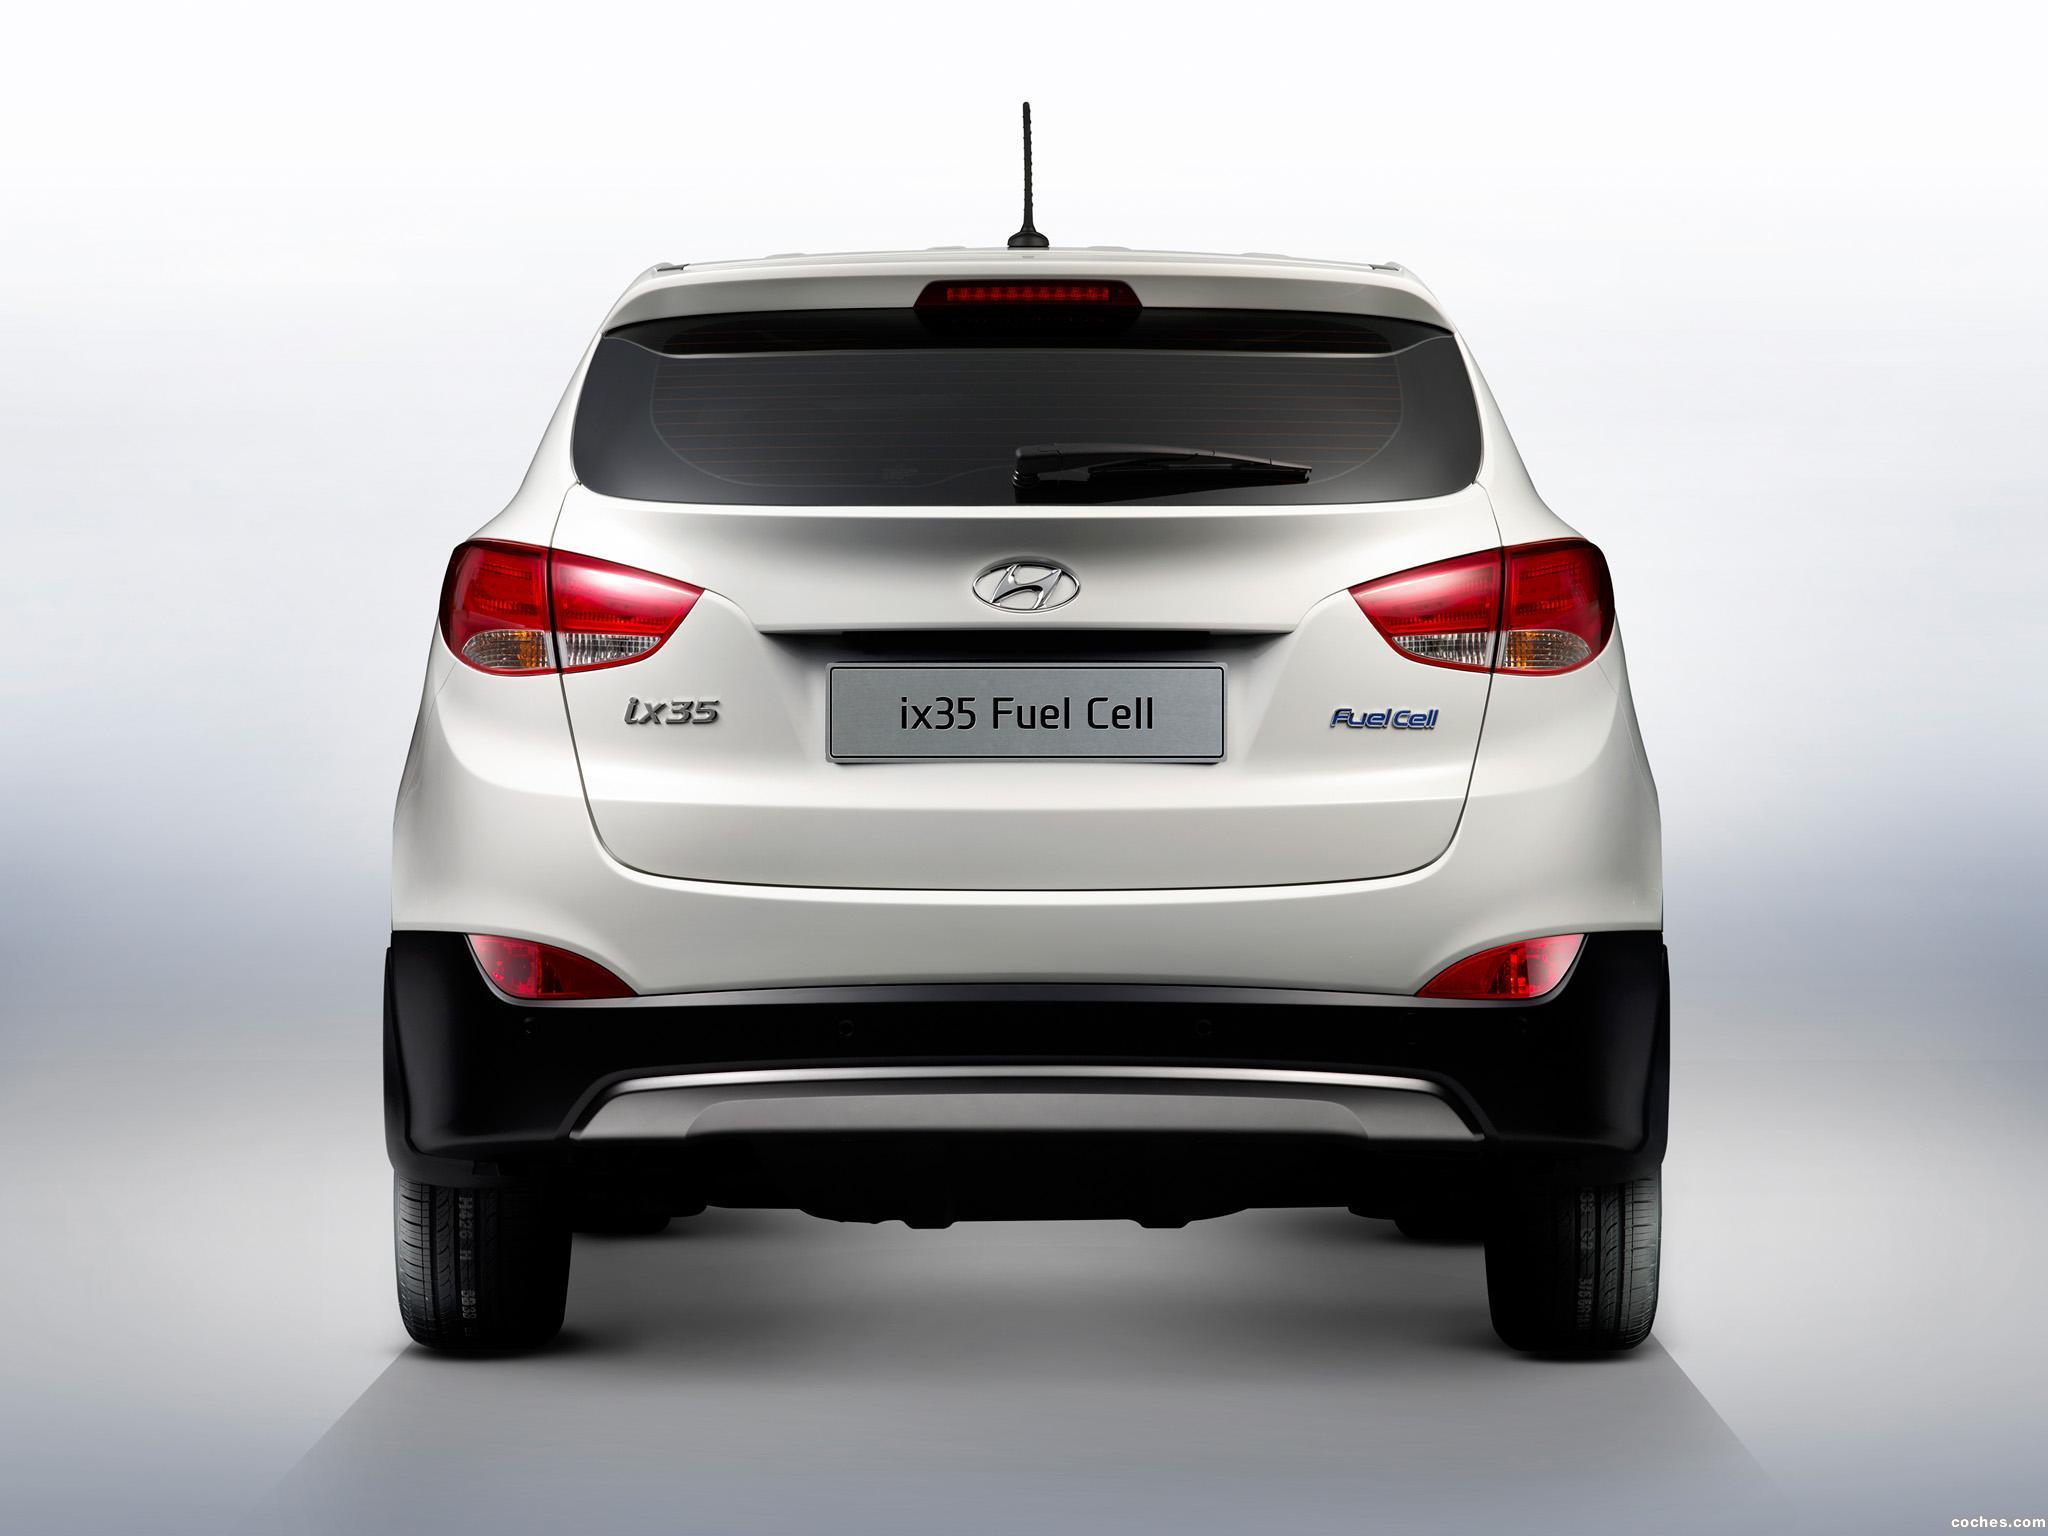 Foto 10 de Hyundai ix35 Fuel Cell 2012